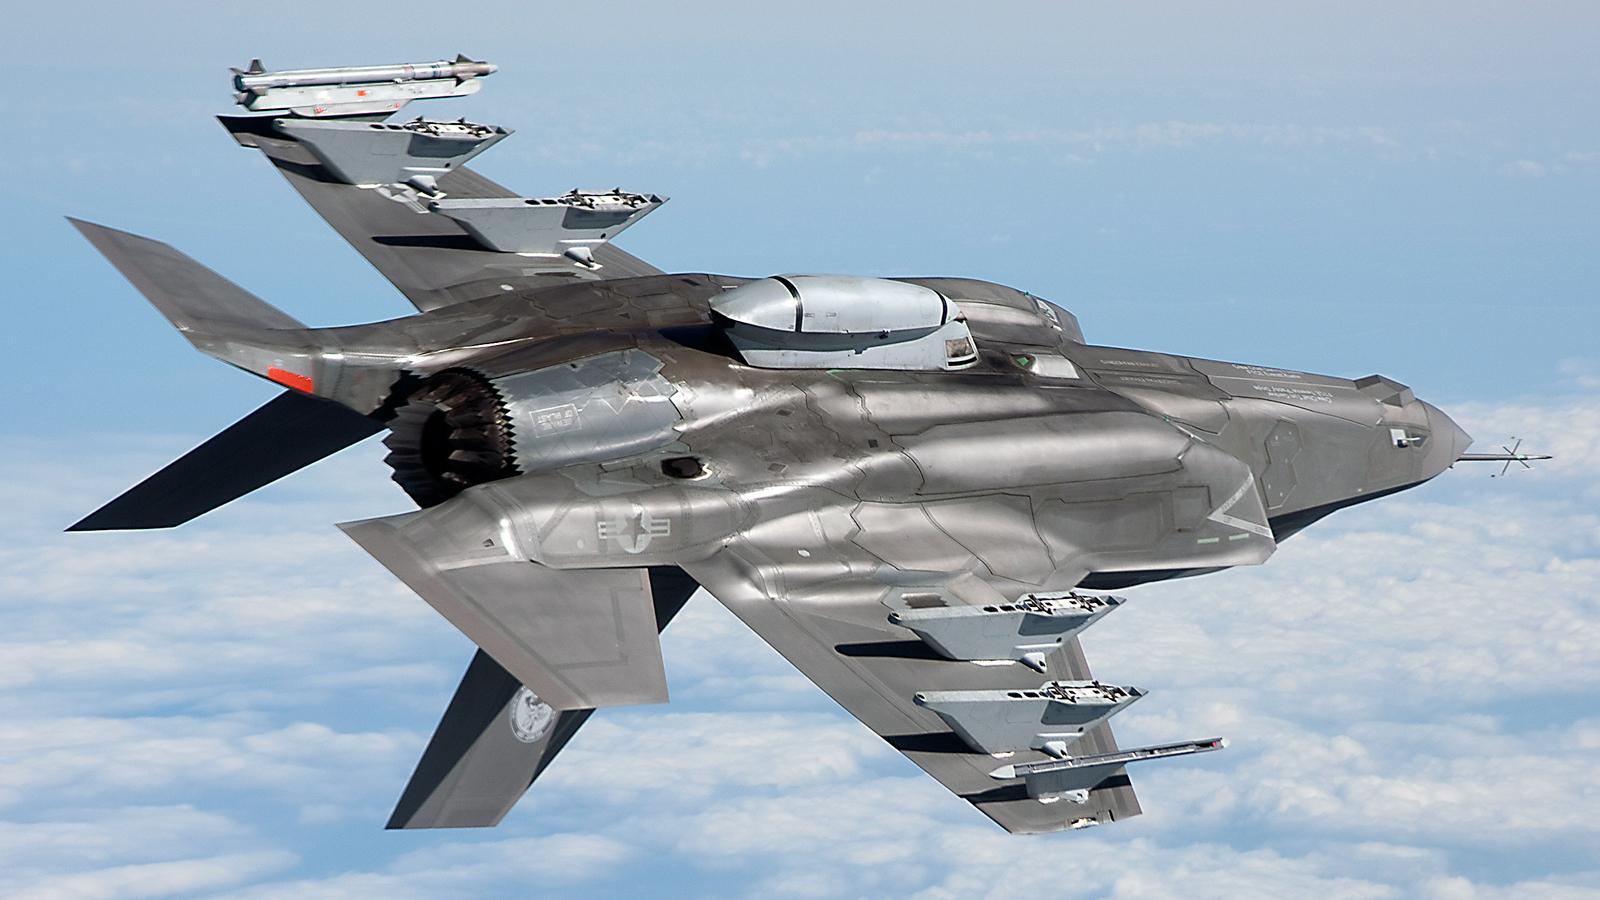 F35 (Lockheed Martin)